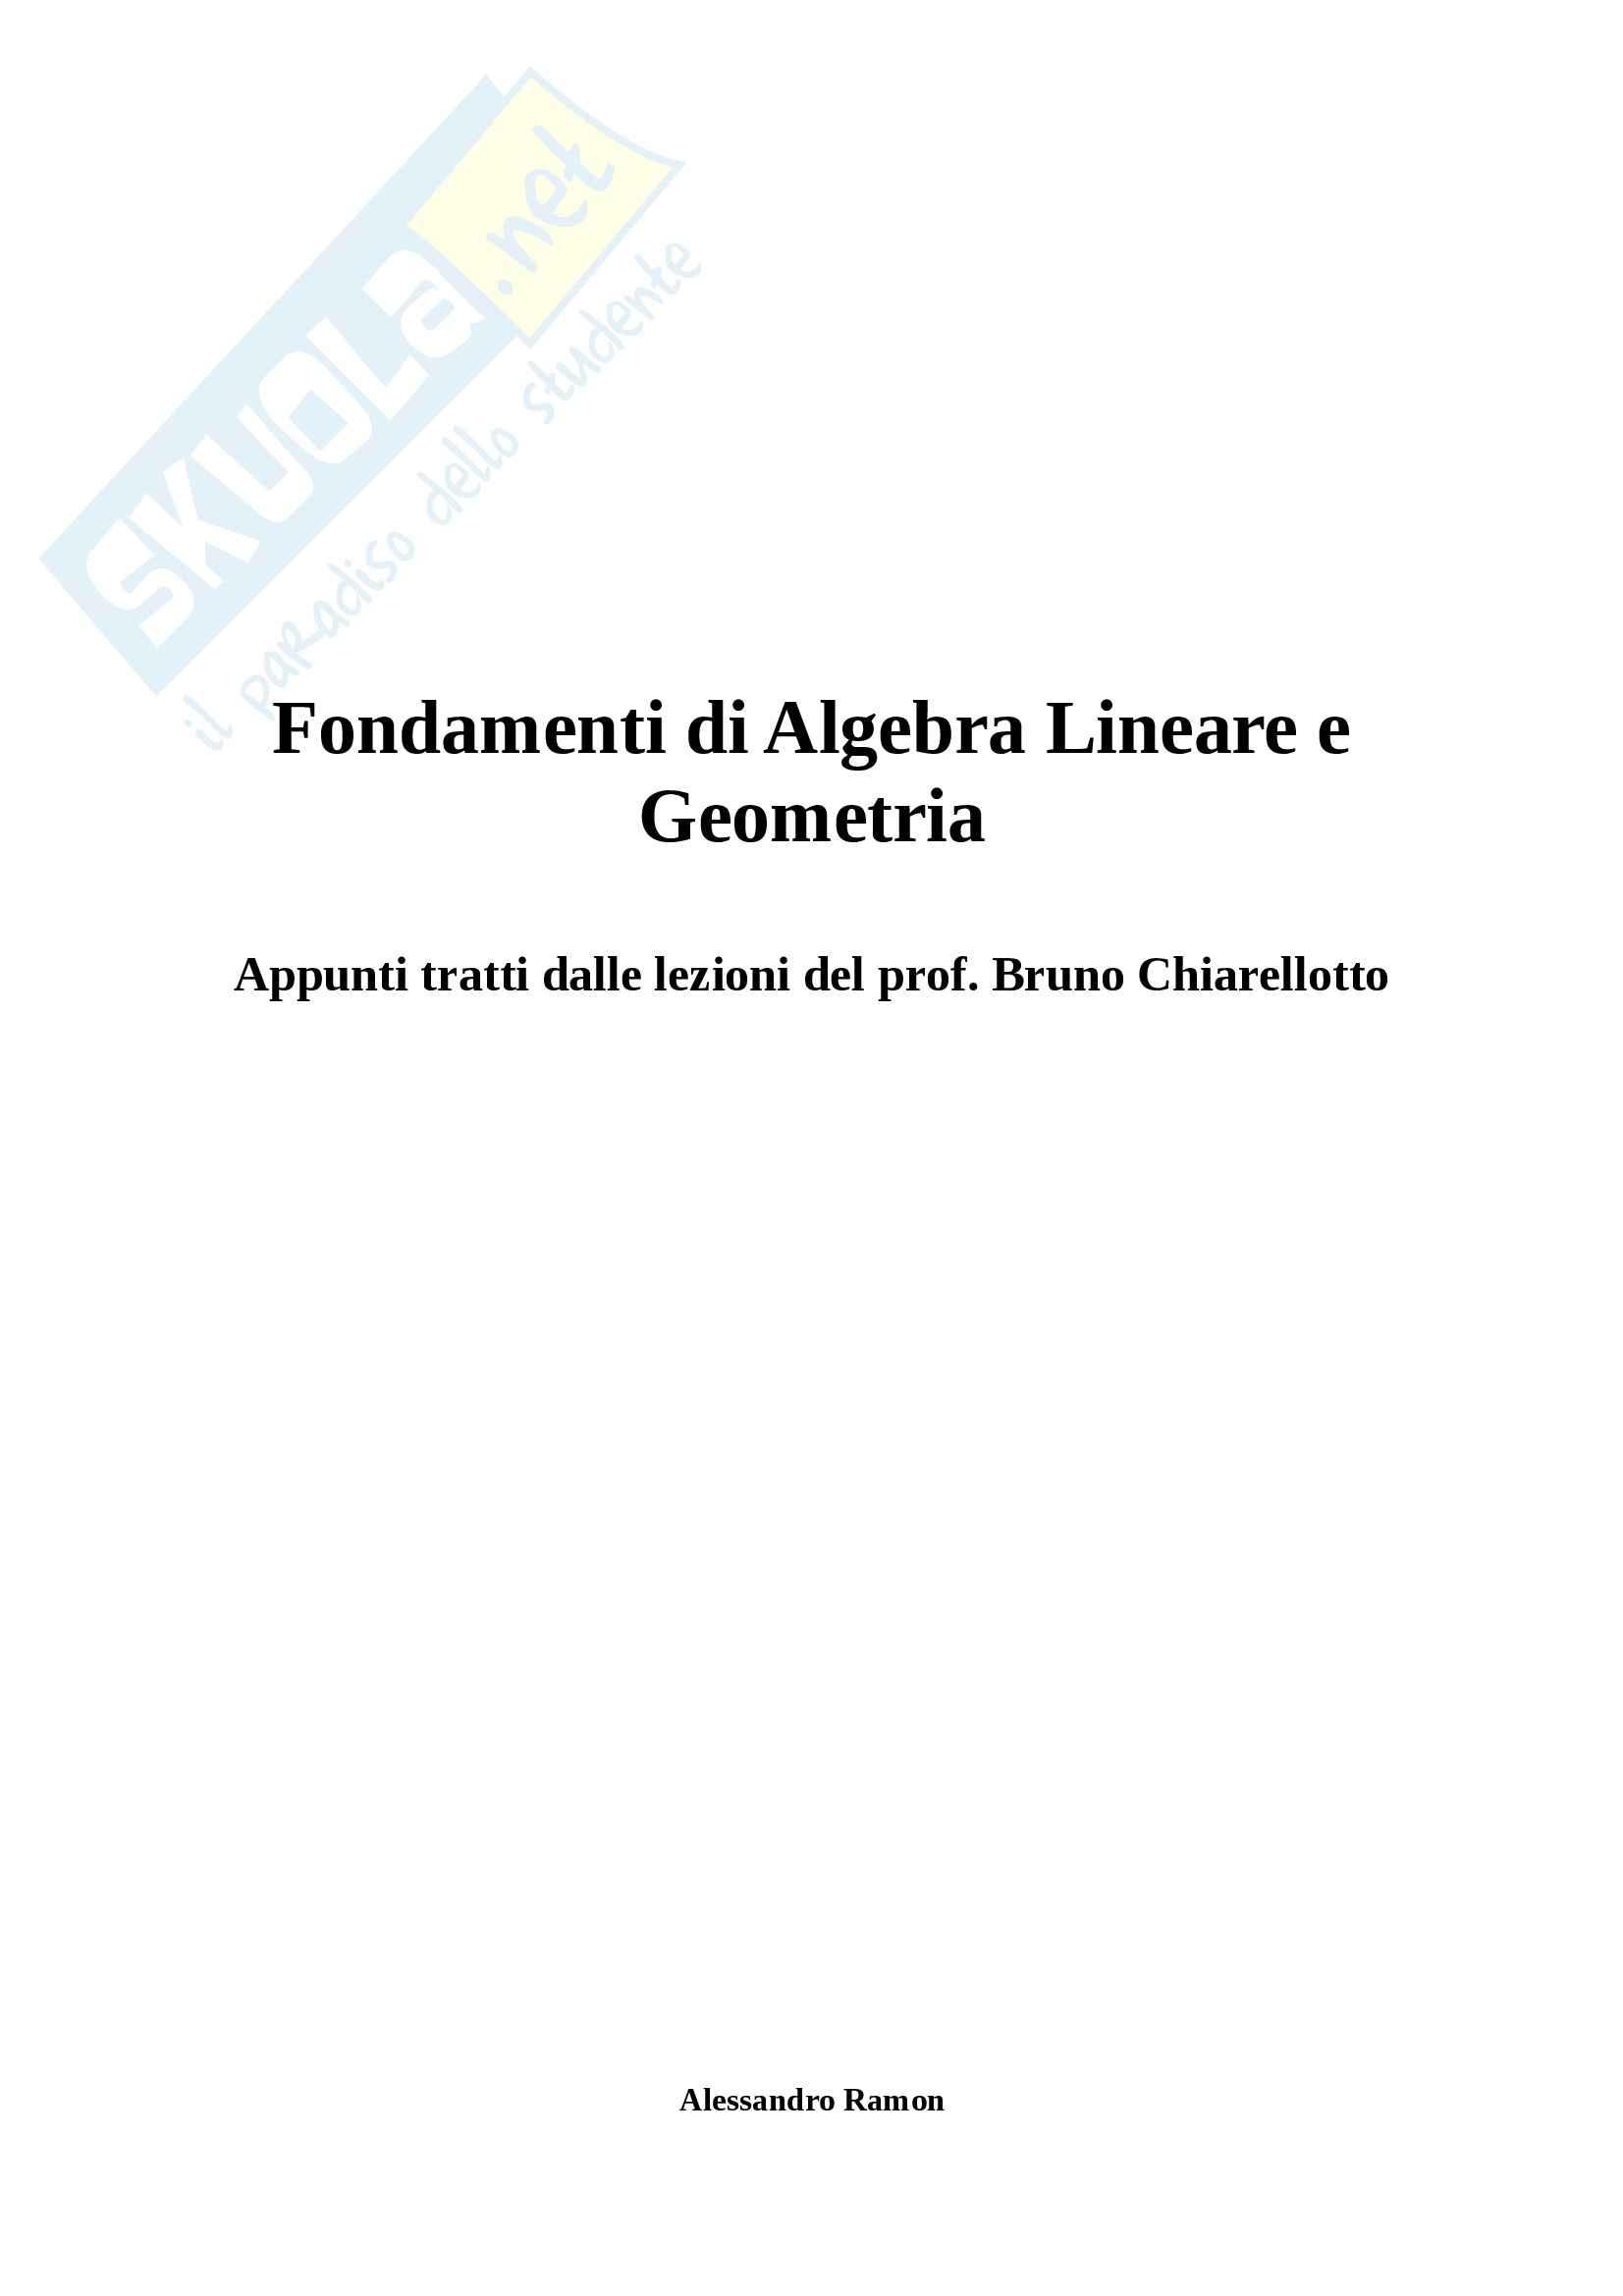 Fondamenti di Algebra Lineare e Geometria - Appunti